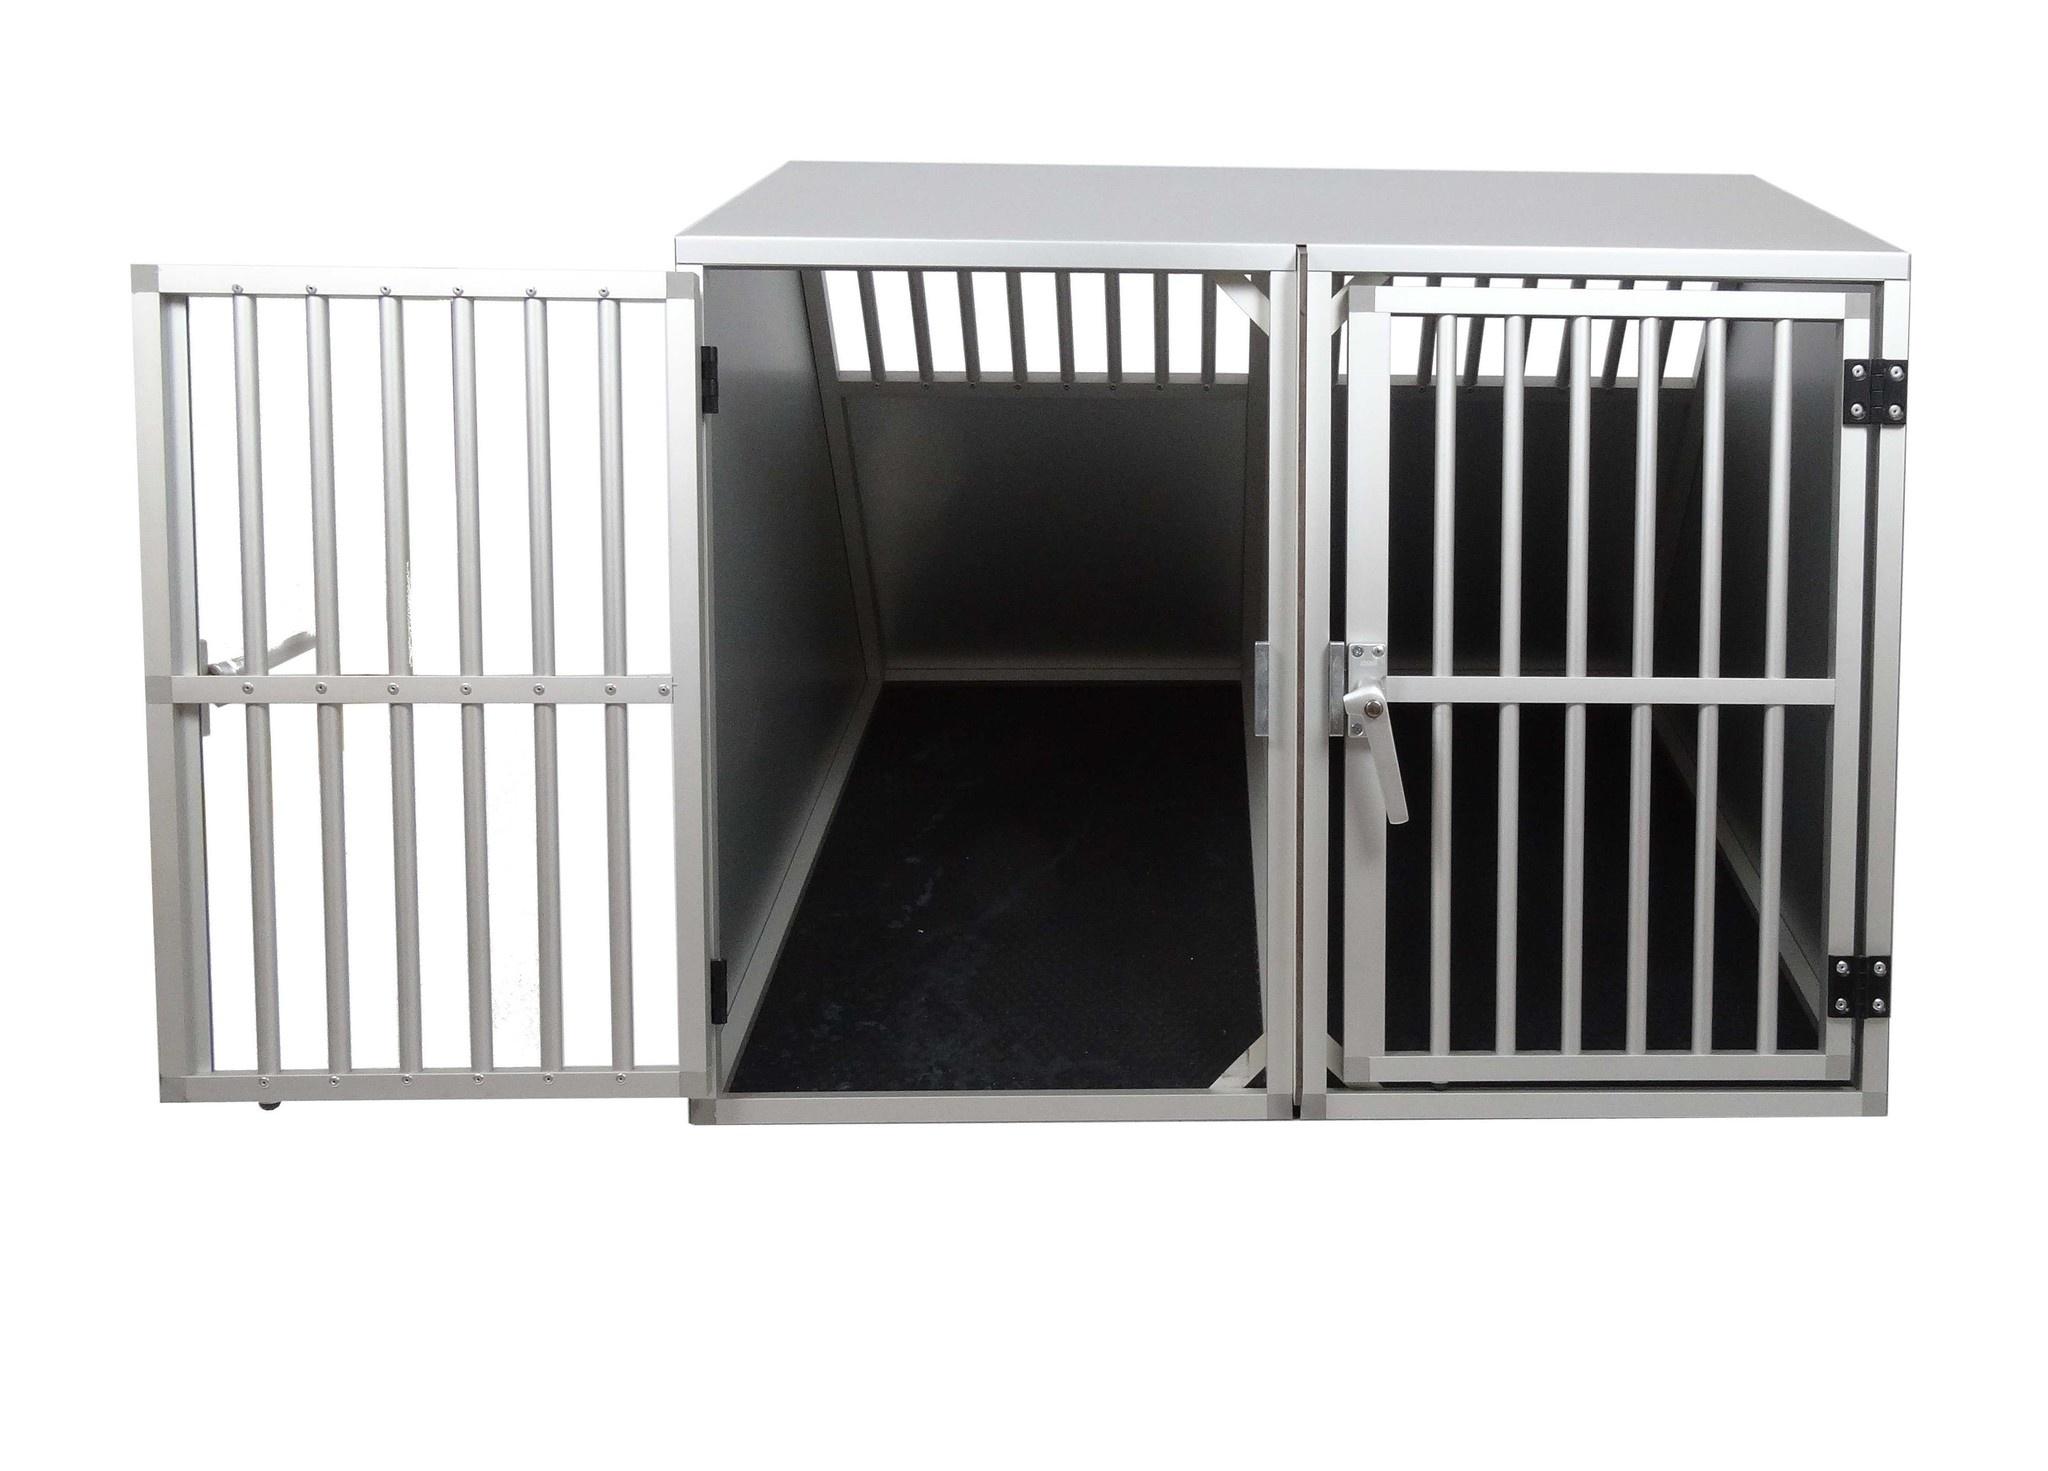 Hundos  Hundos Pro Aluminium Autobench Duo large